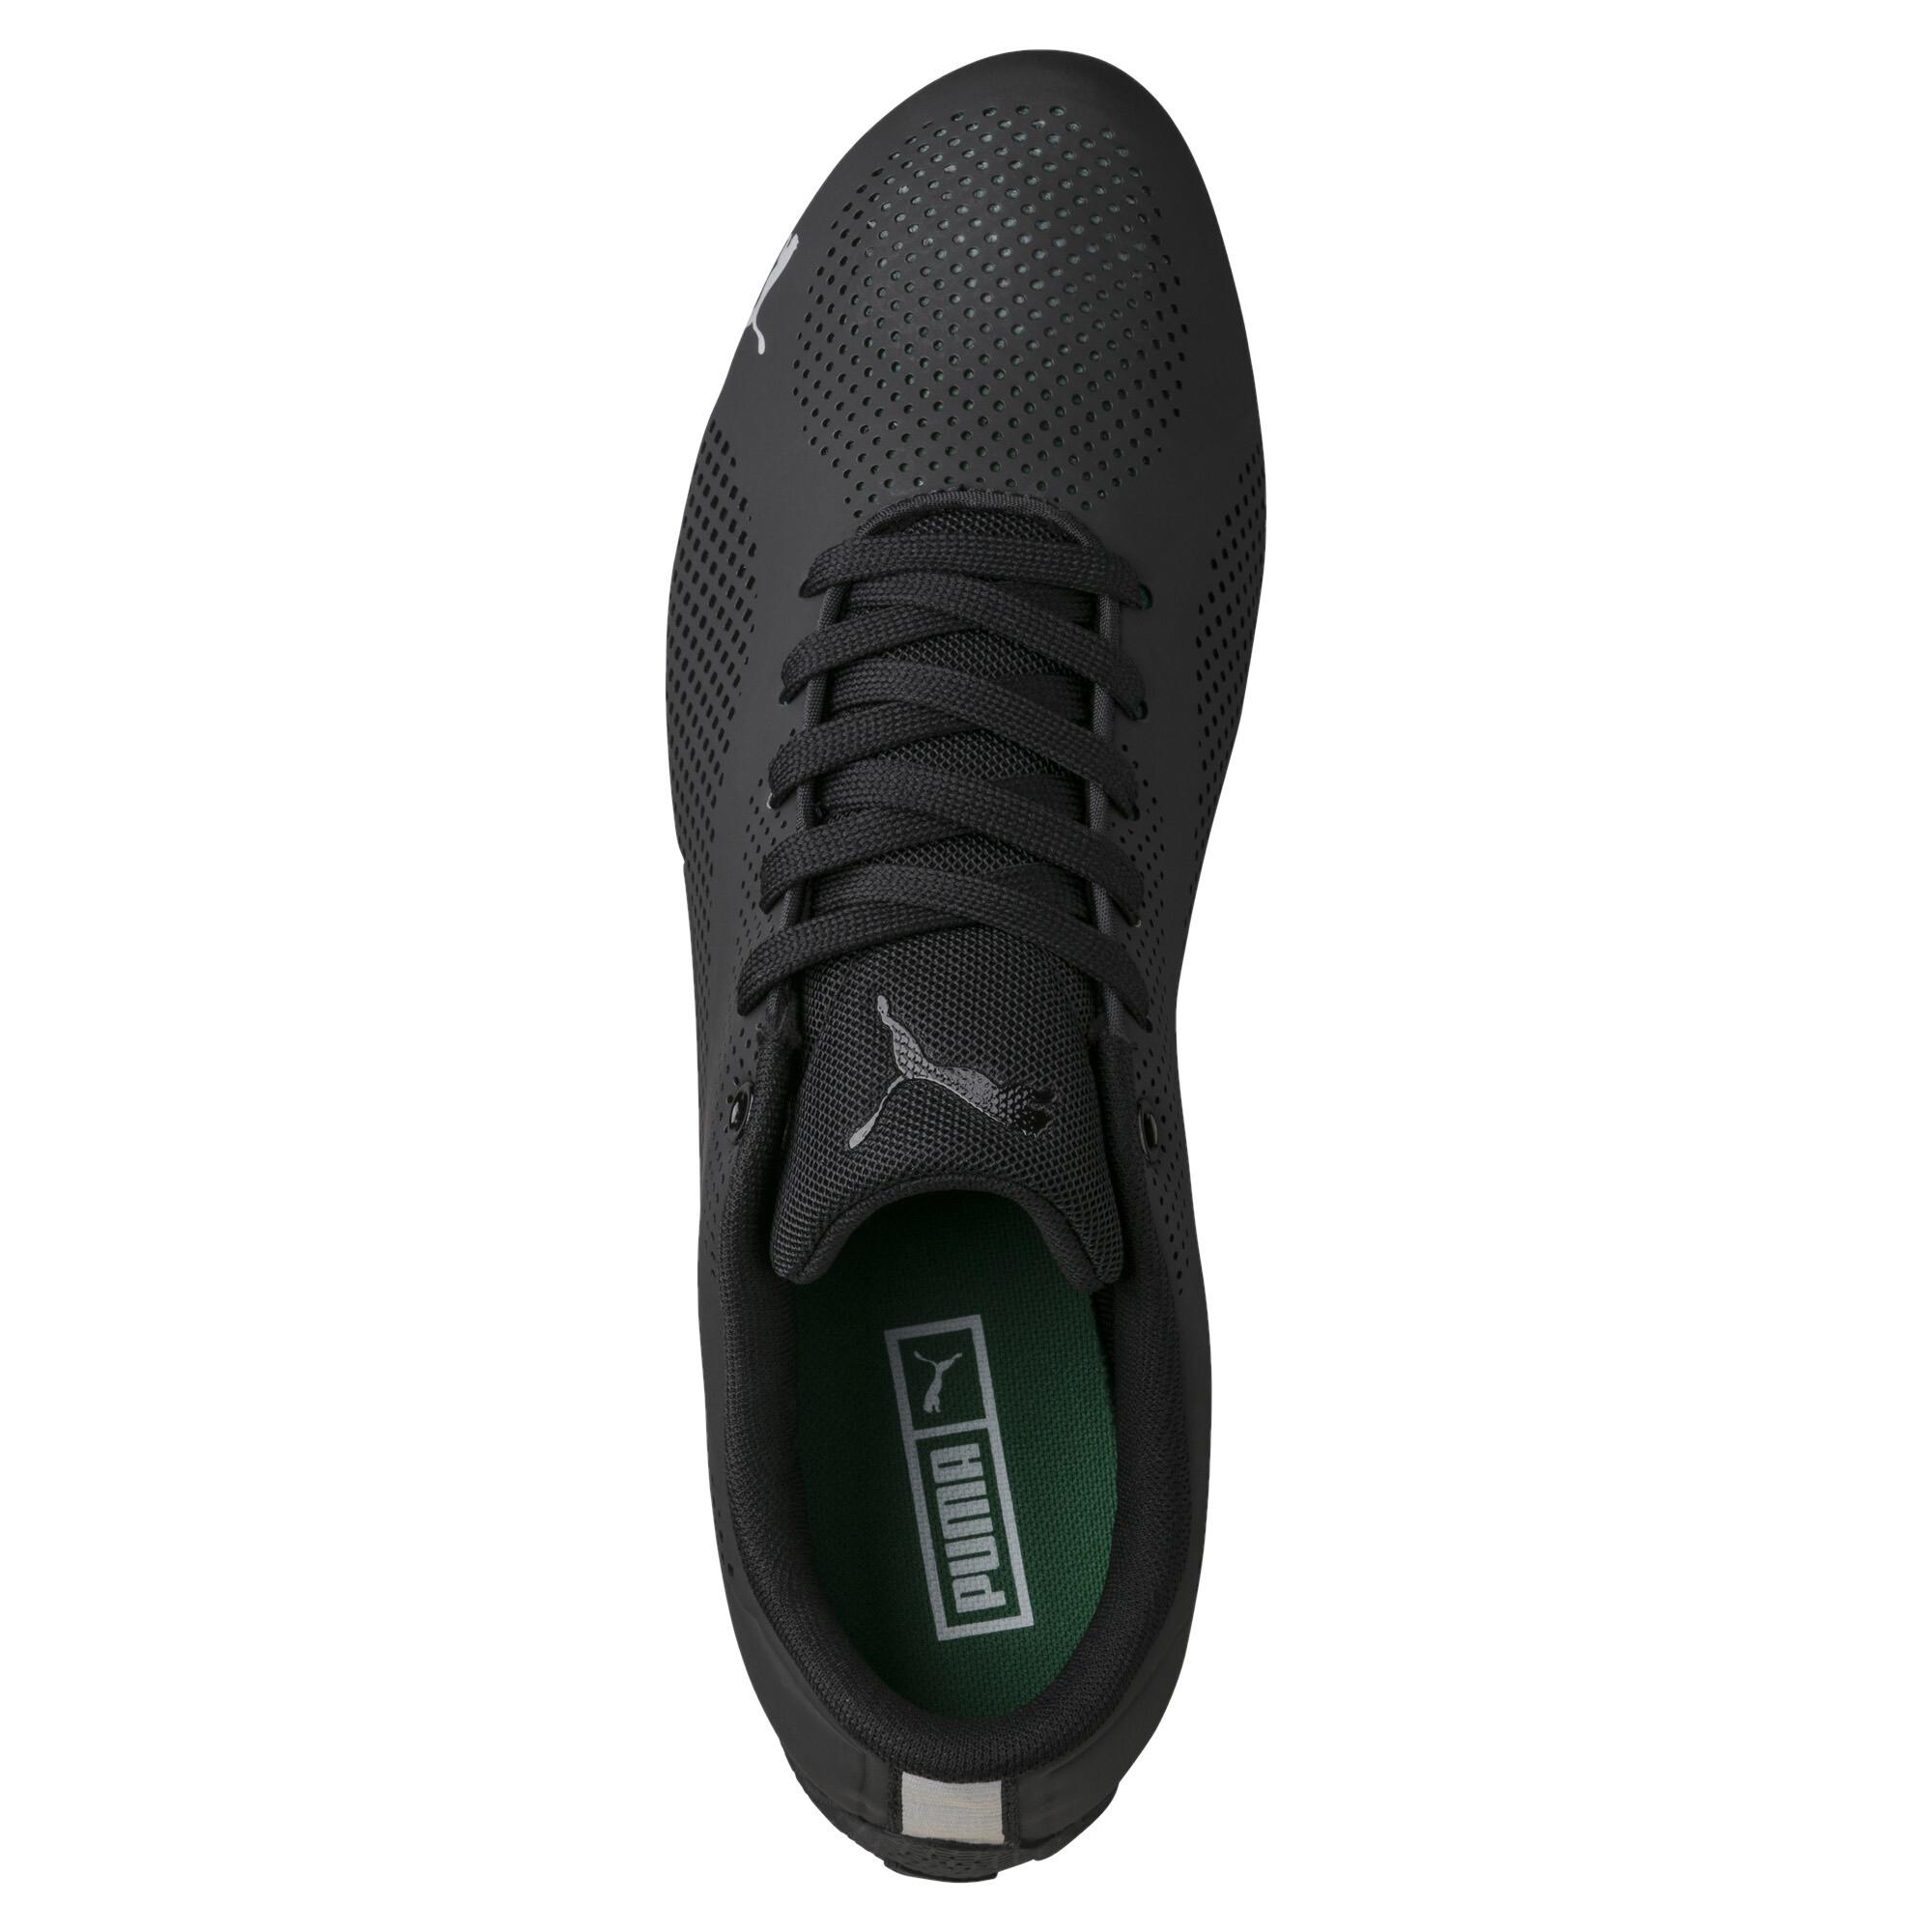 PUMA-Drift-Cat-Ultra-Reflective-Men-039-s-Shoes-Men-Shoe-Sport-Classics thumbnail 6